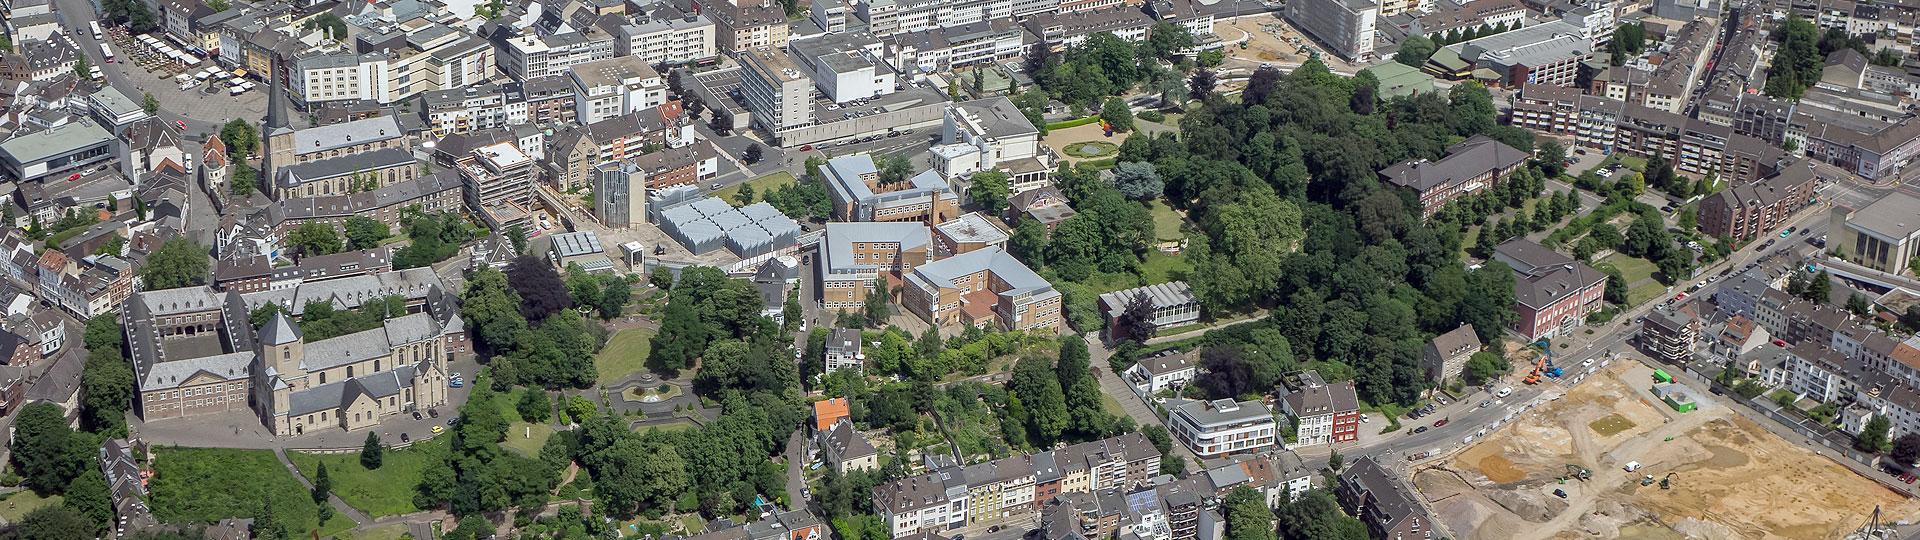 Foto Luftaufnahme Abteiberg